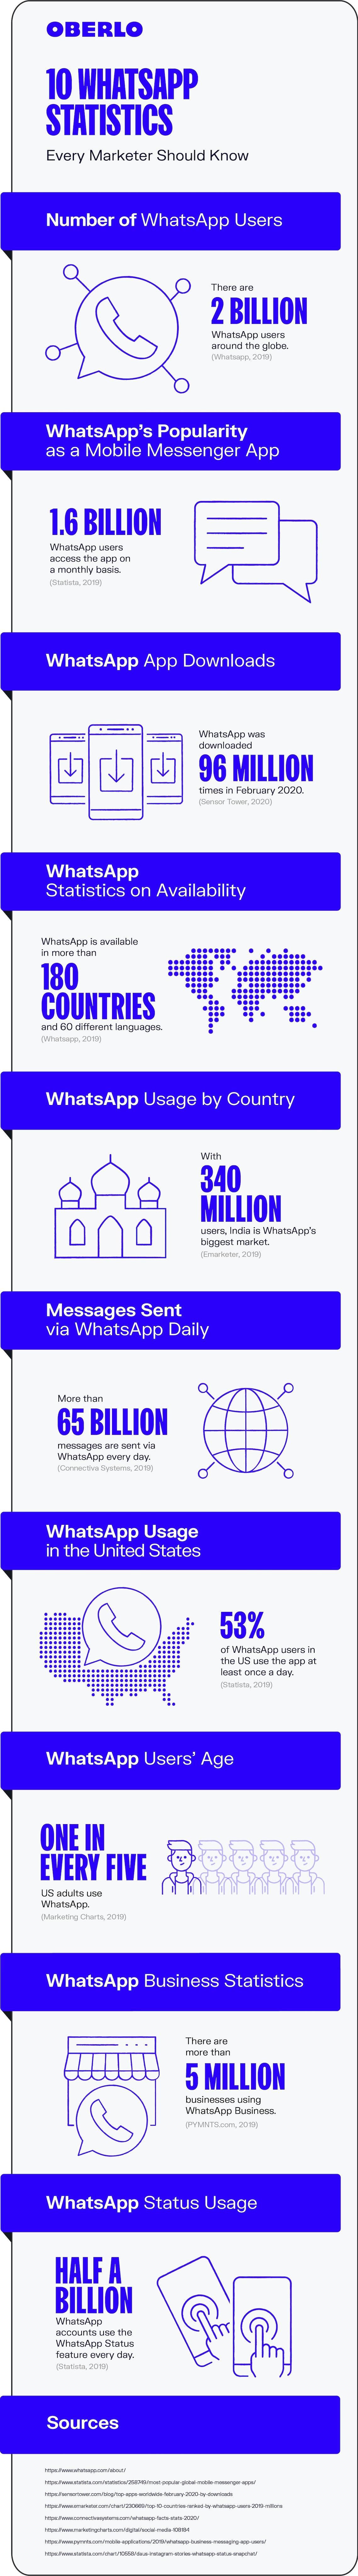 WhatsApp Statistics 2020